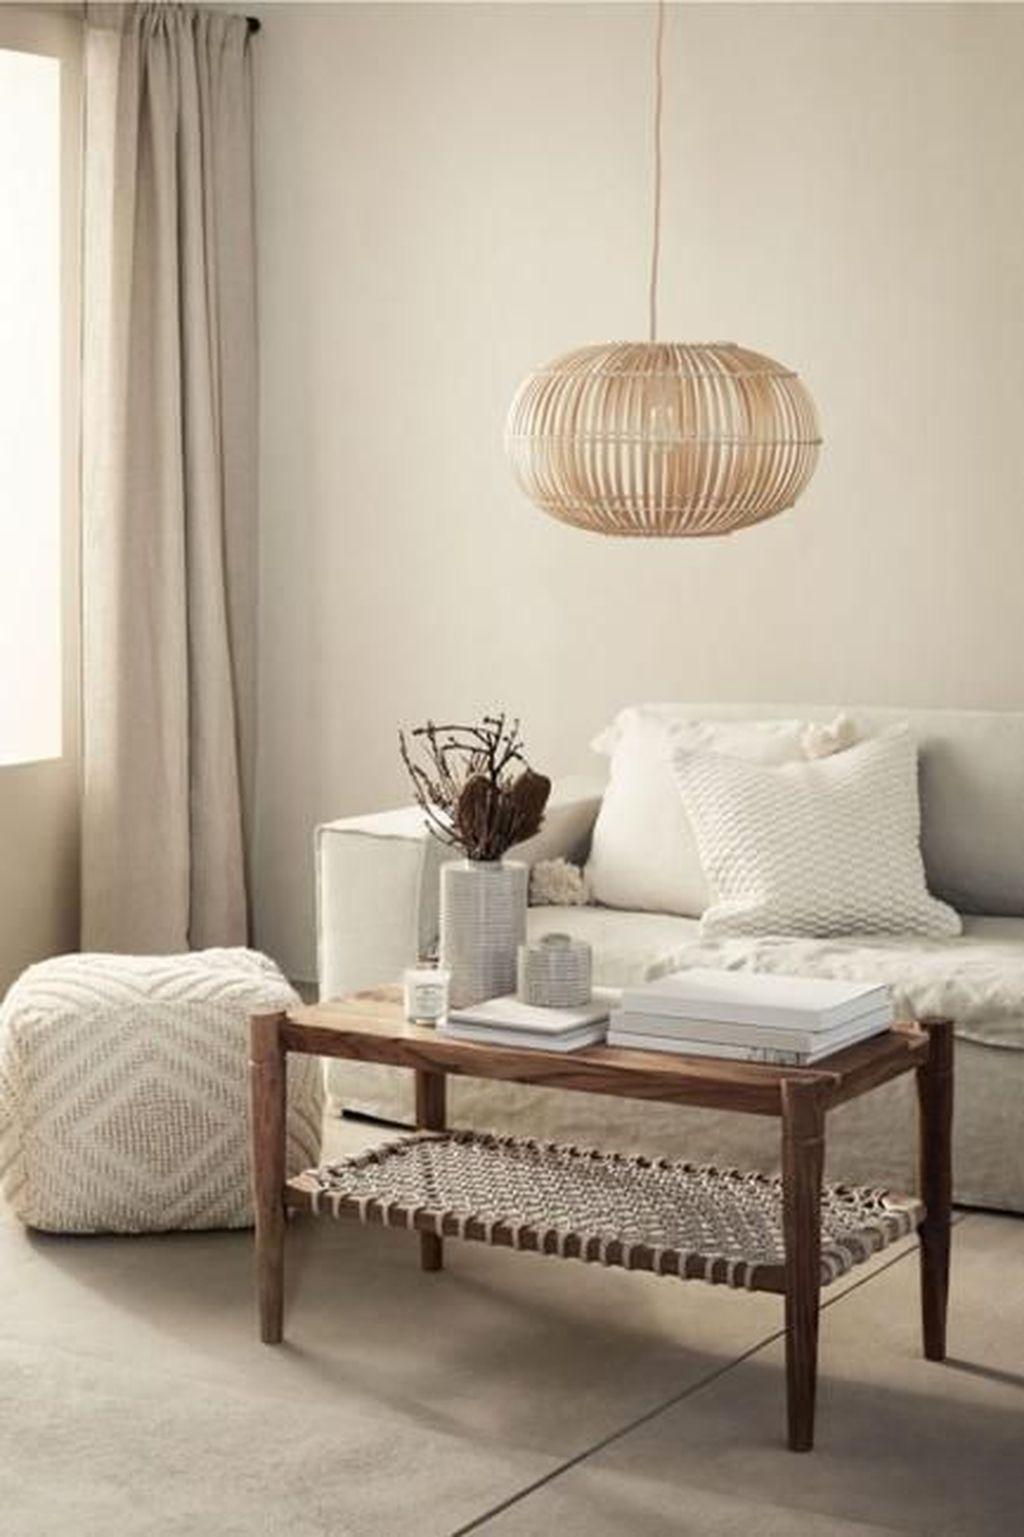 Inspiring Modern Home Furnishings Design Ideas 04